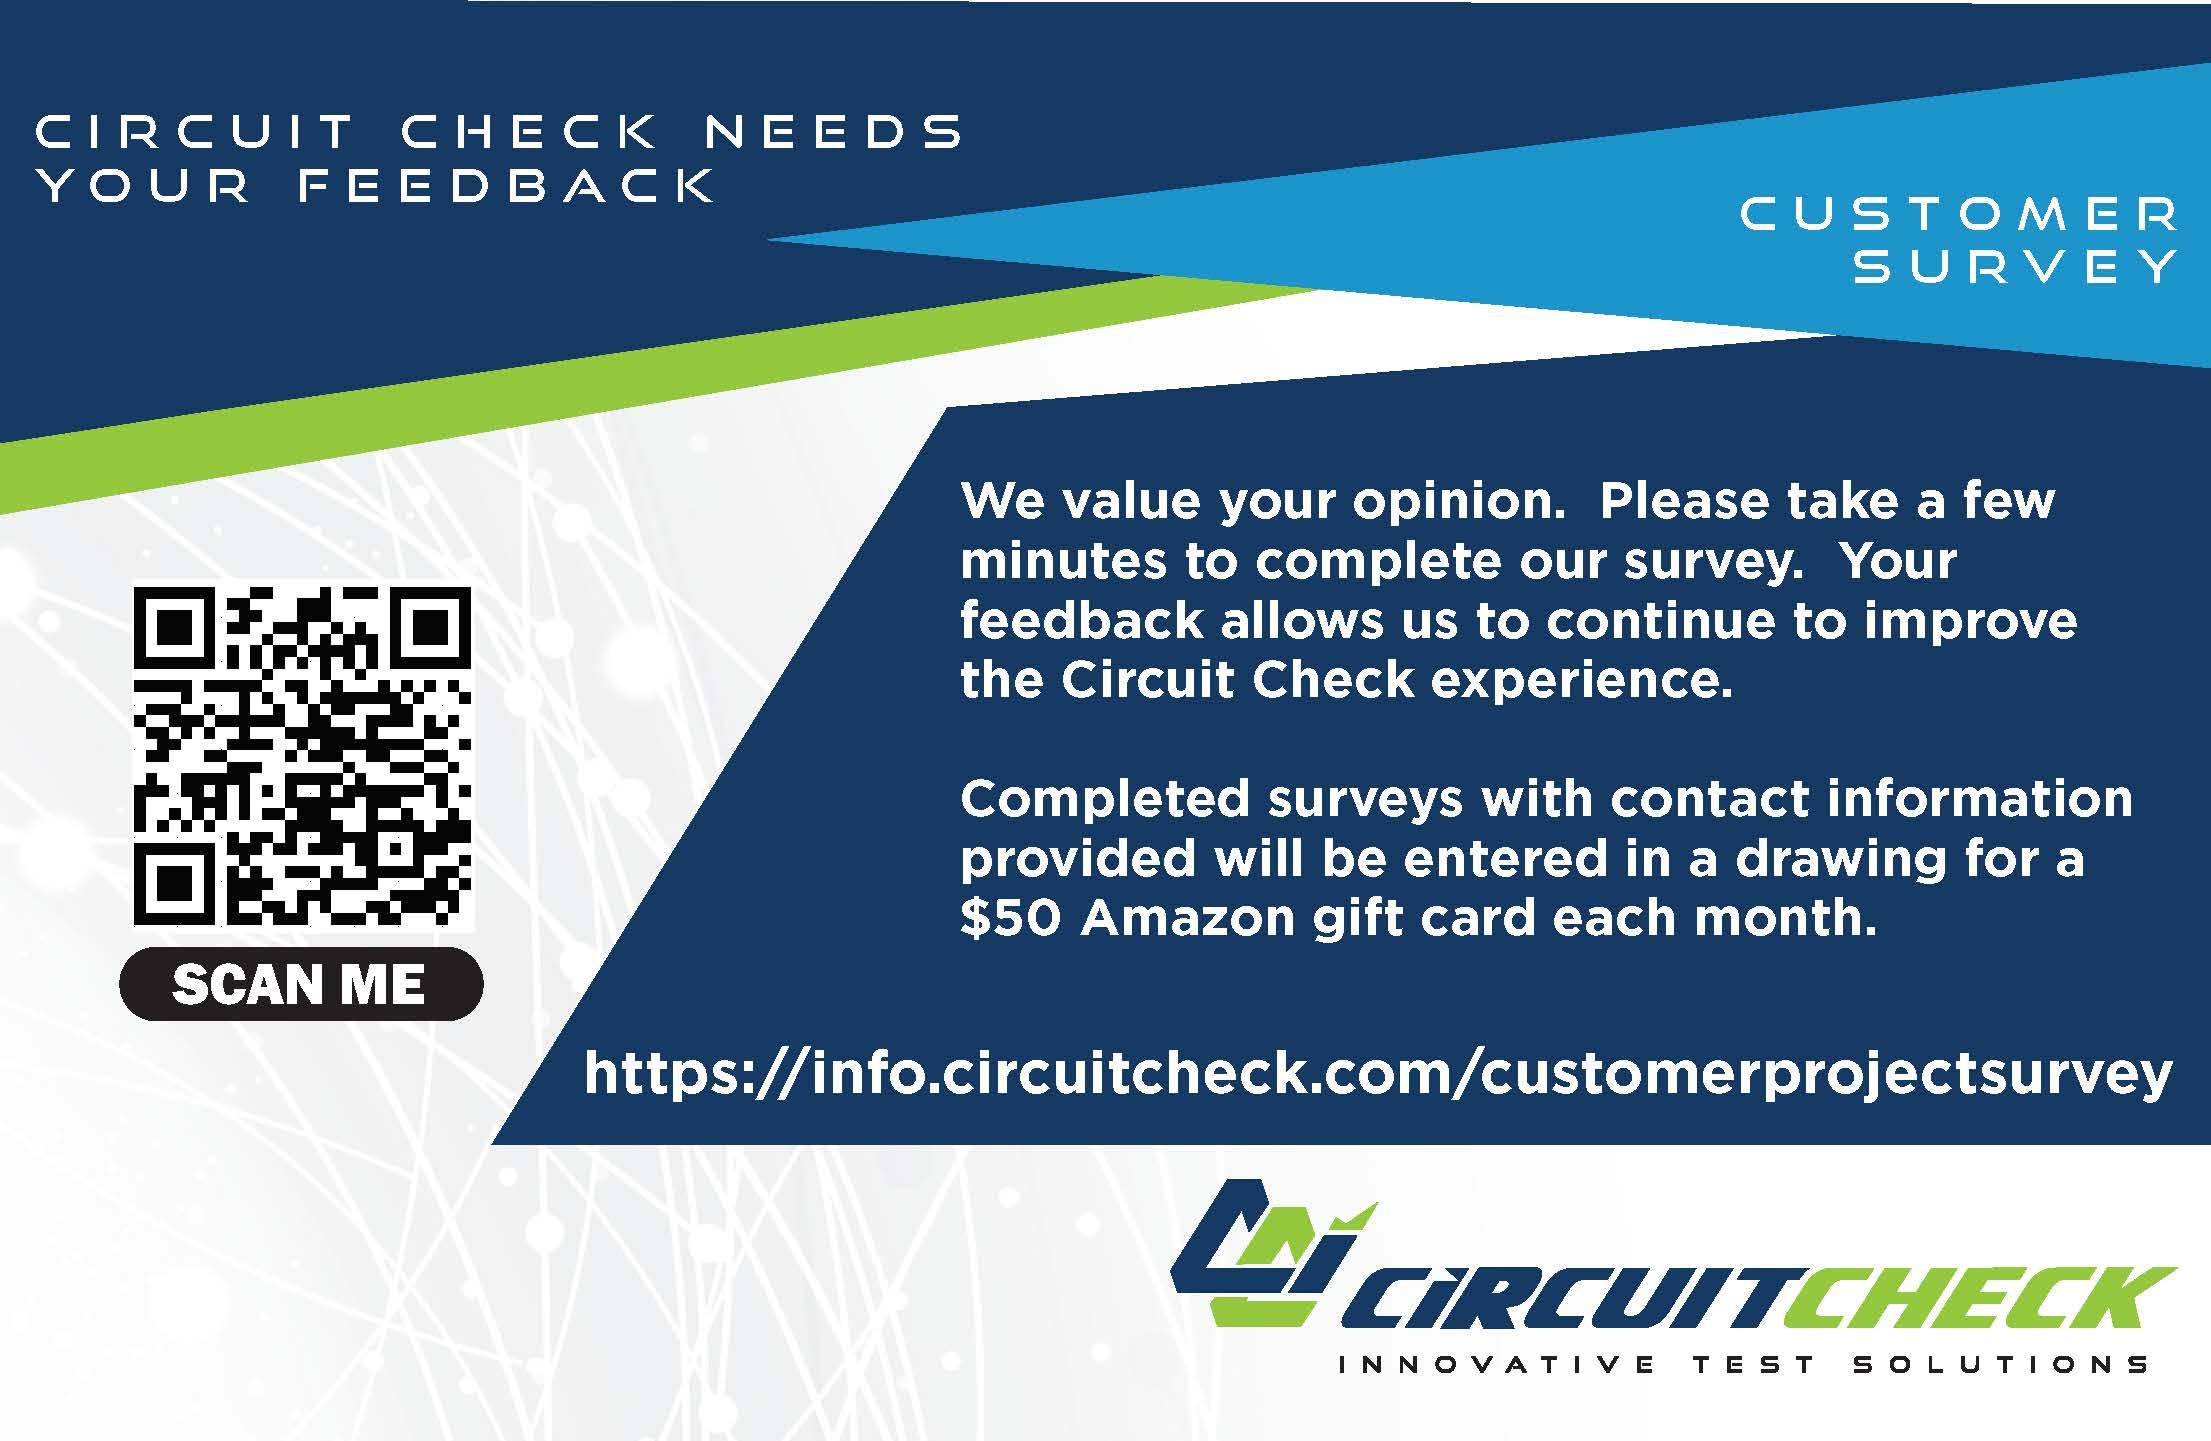 Circuit Check Needs Your Feedback